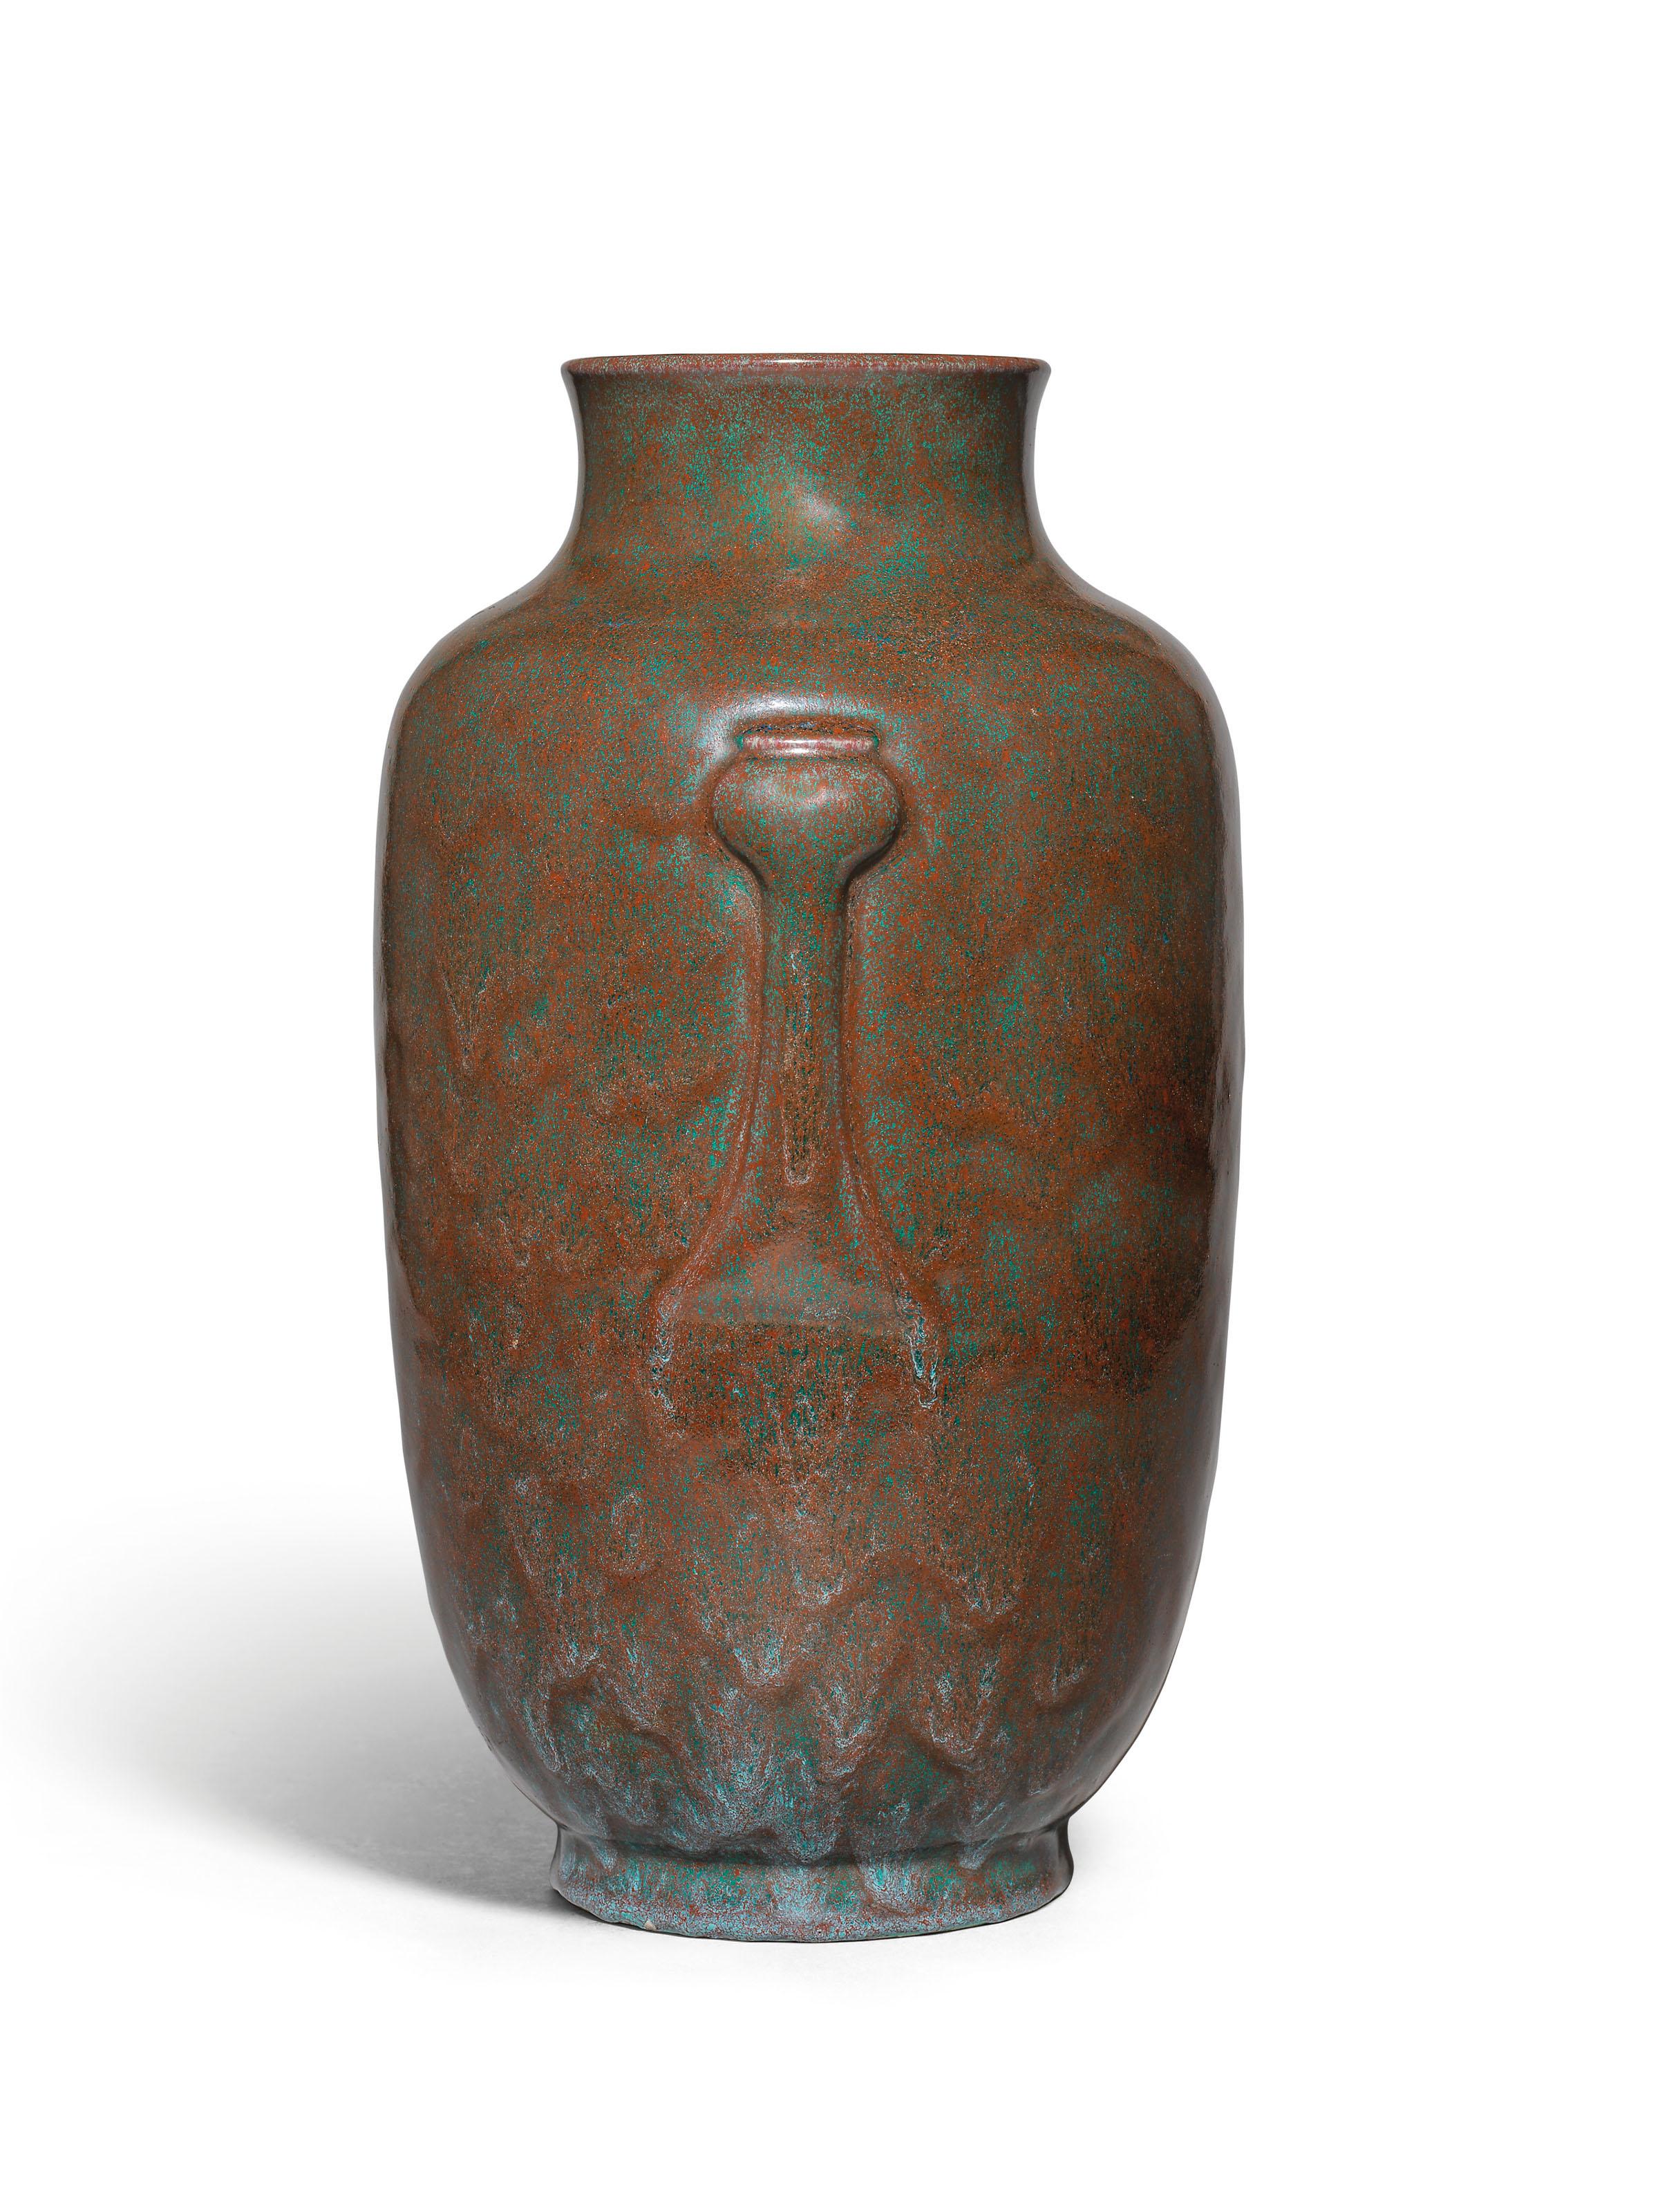 Other Antique Decorative Arts Helpful Bakelit Vase Wide Varieties Antiques